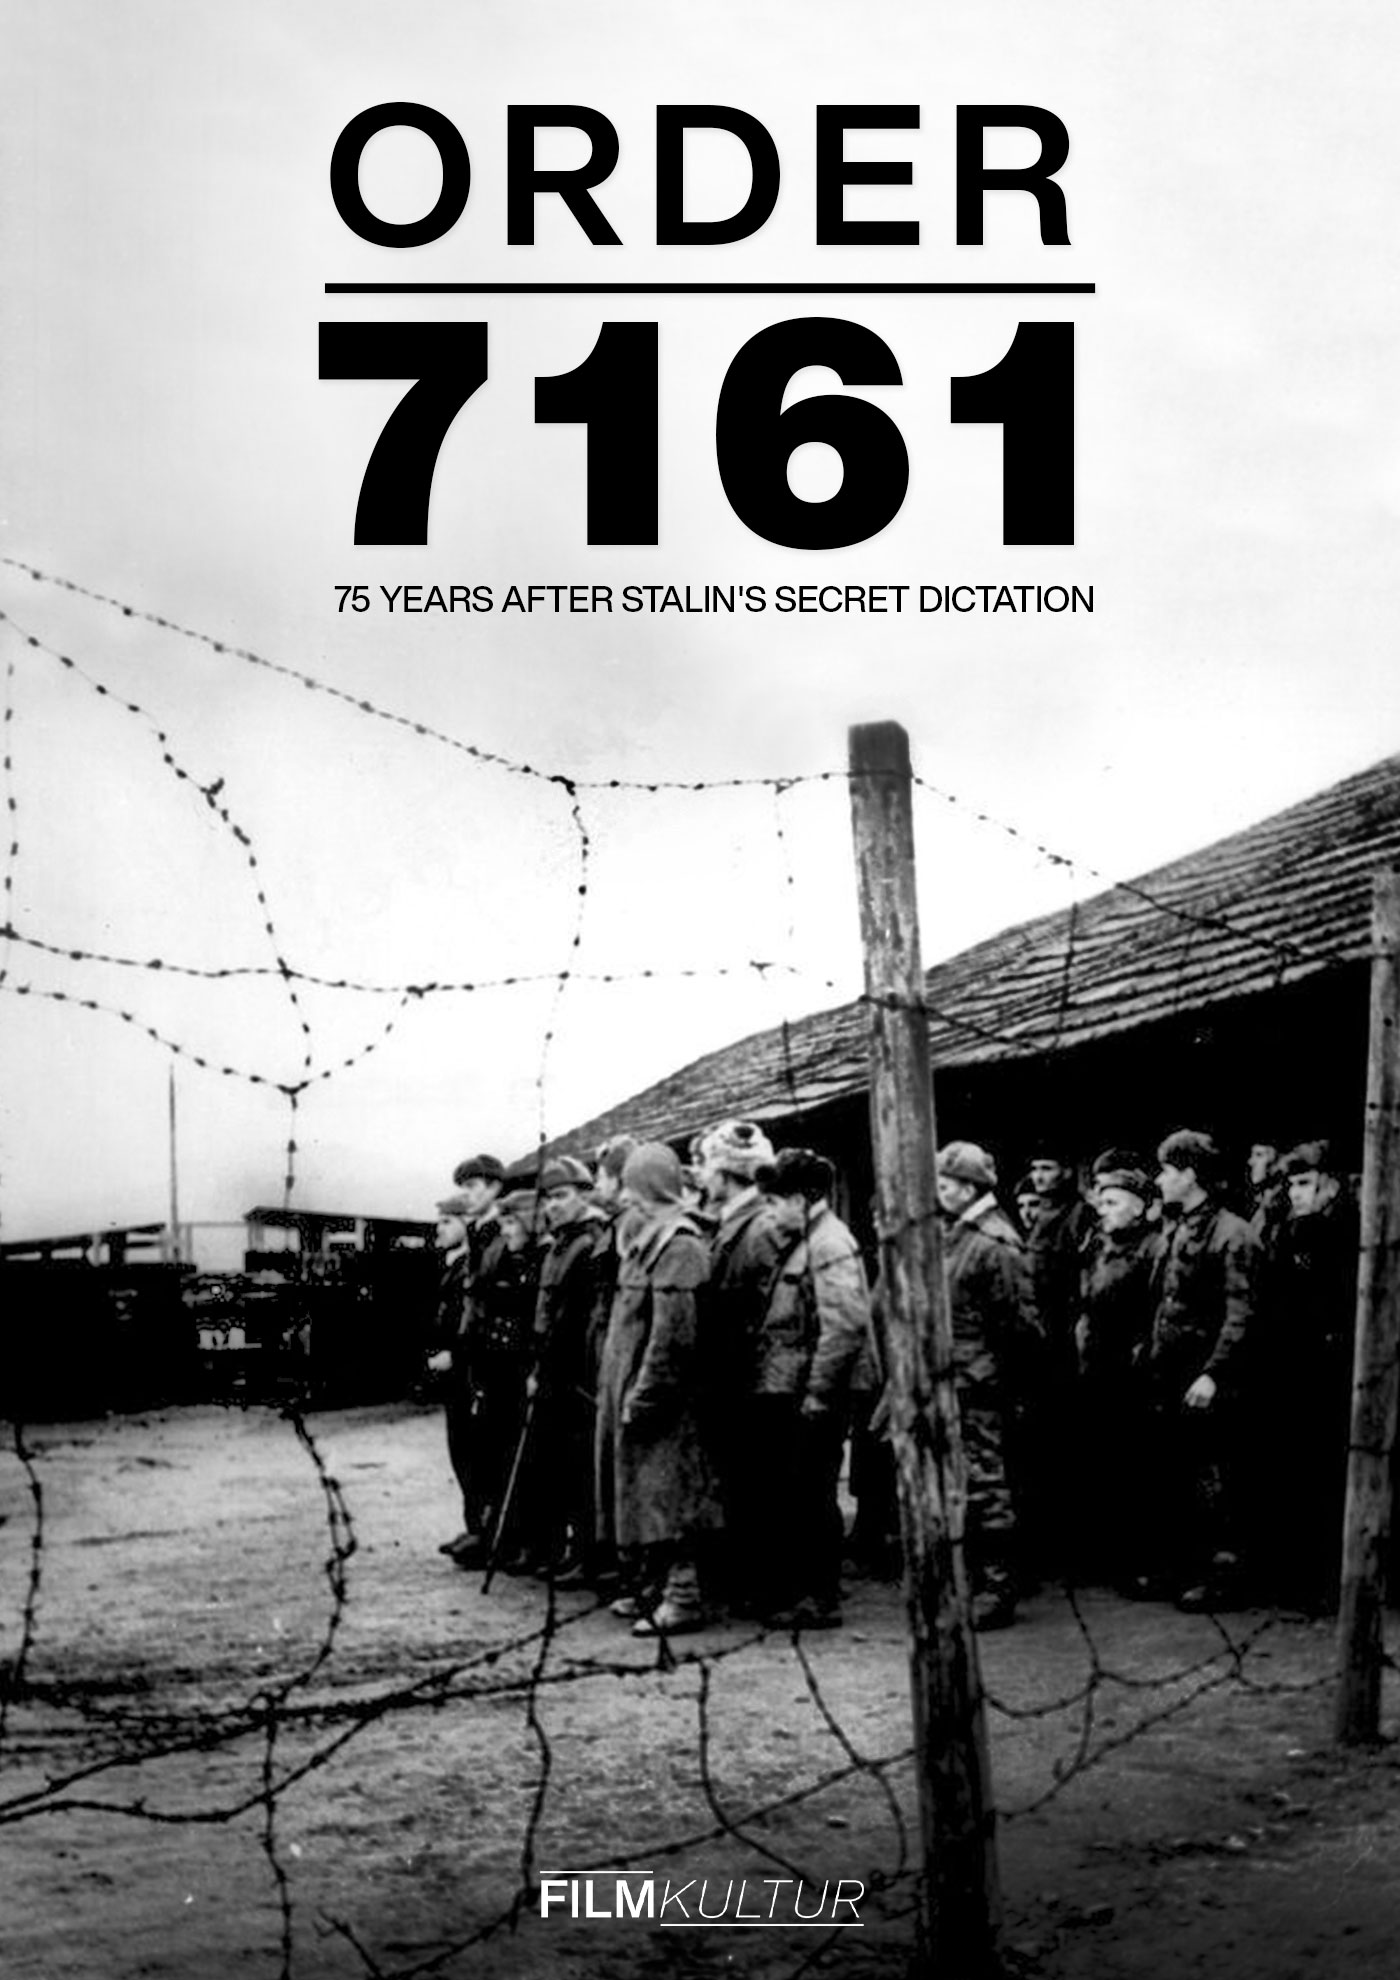 Filmplakat ORDER 7161